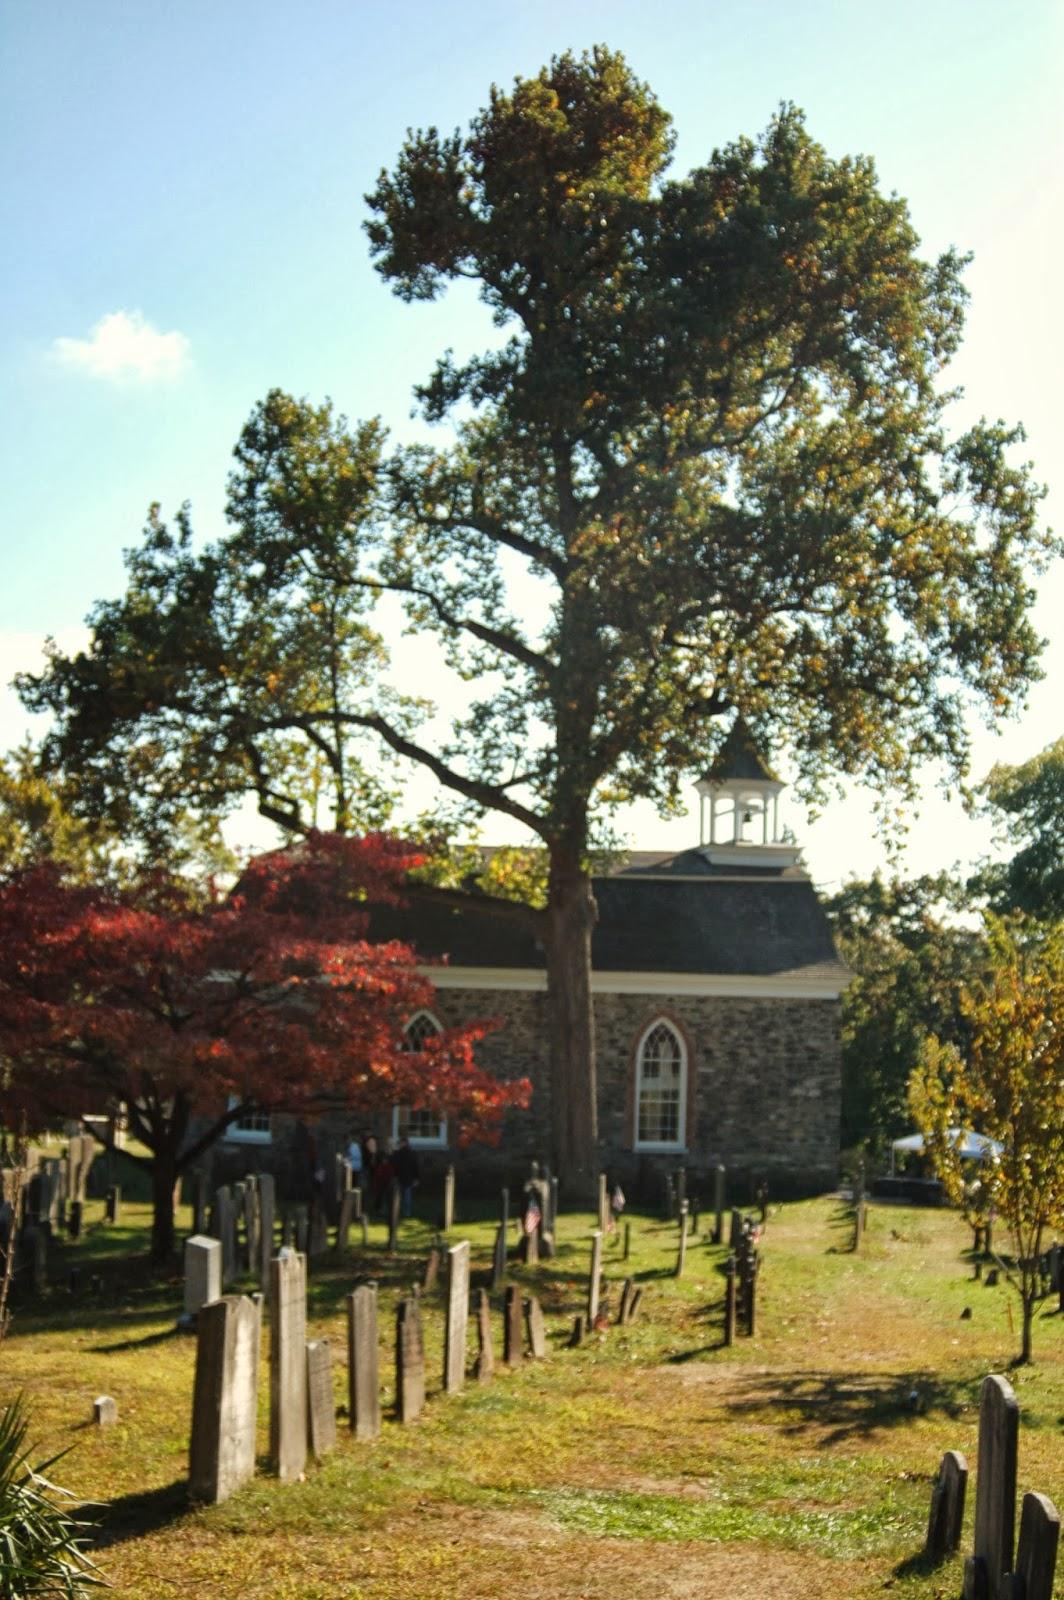 Bygone Living October In Sleepy Hollow